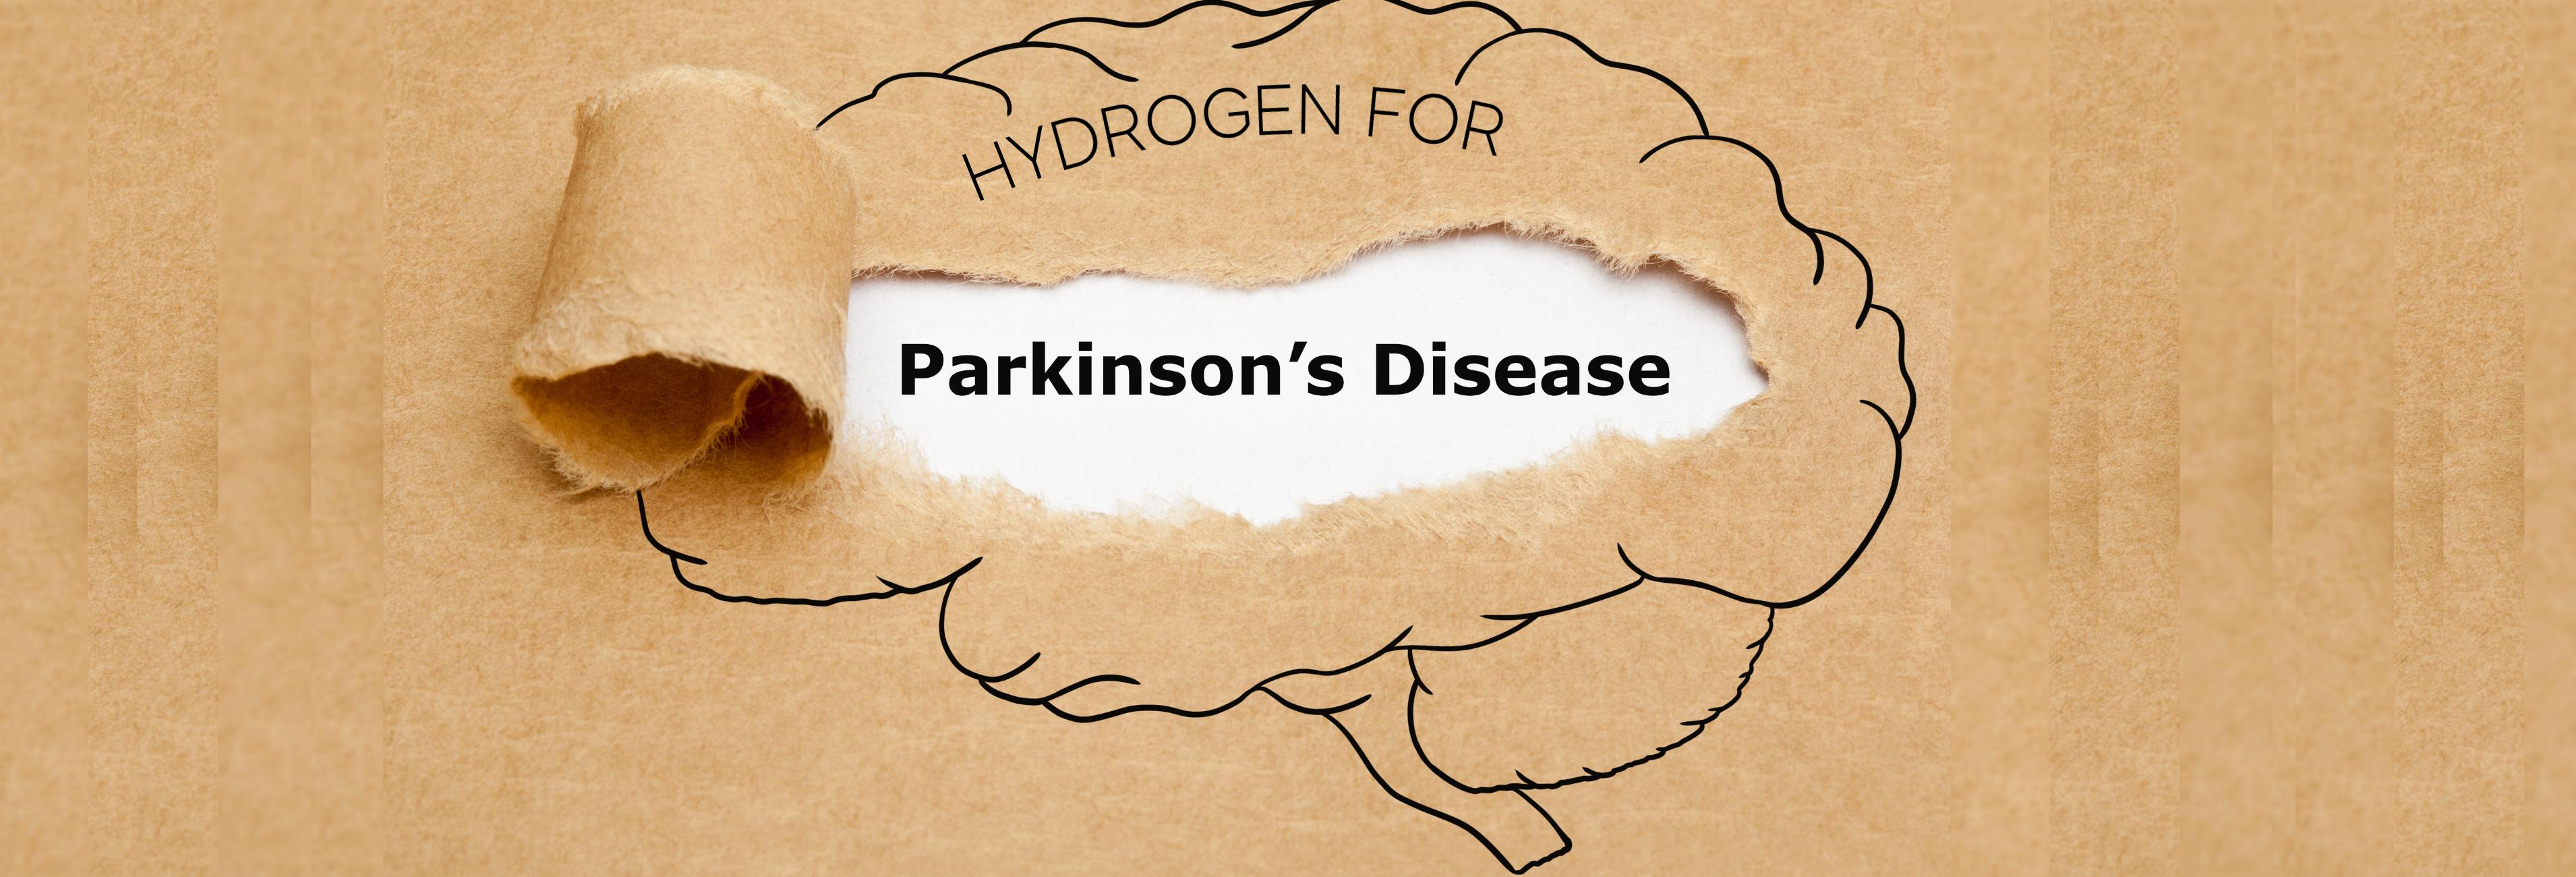 Hydrogen water benefits for Parkinson's Disease.